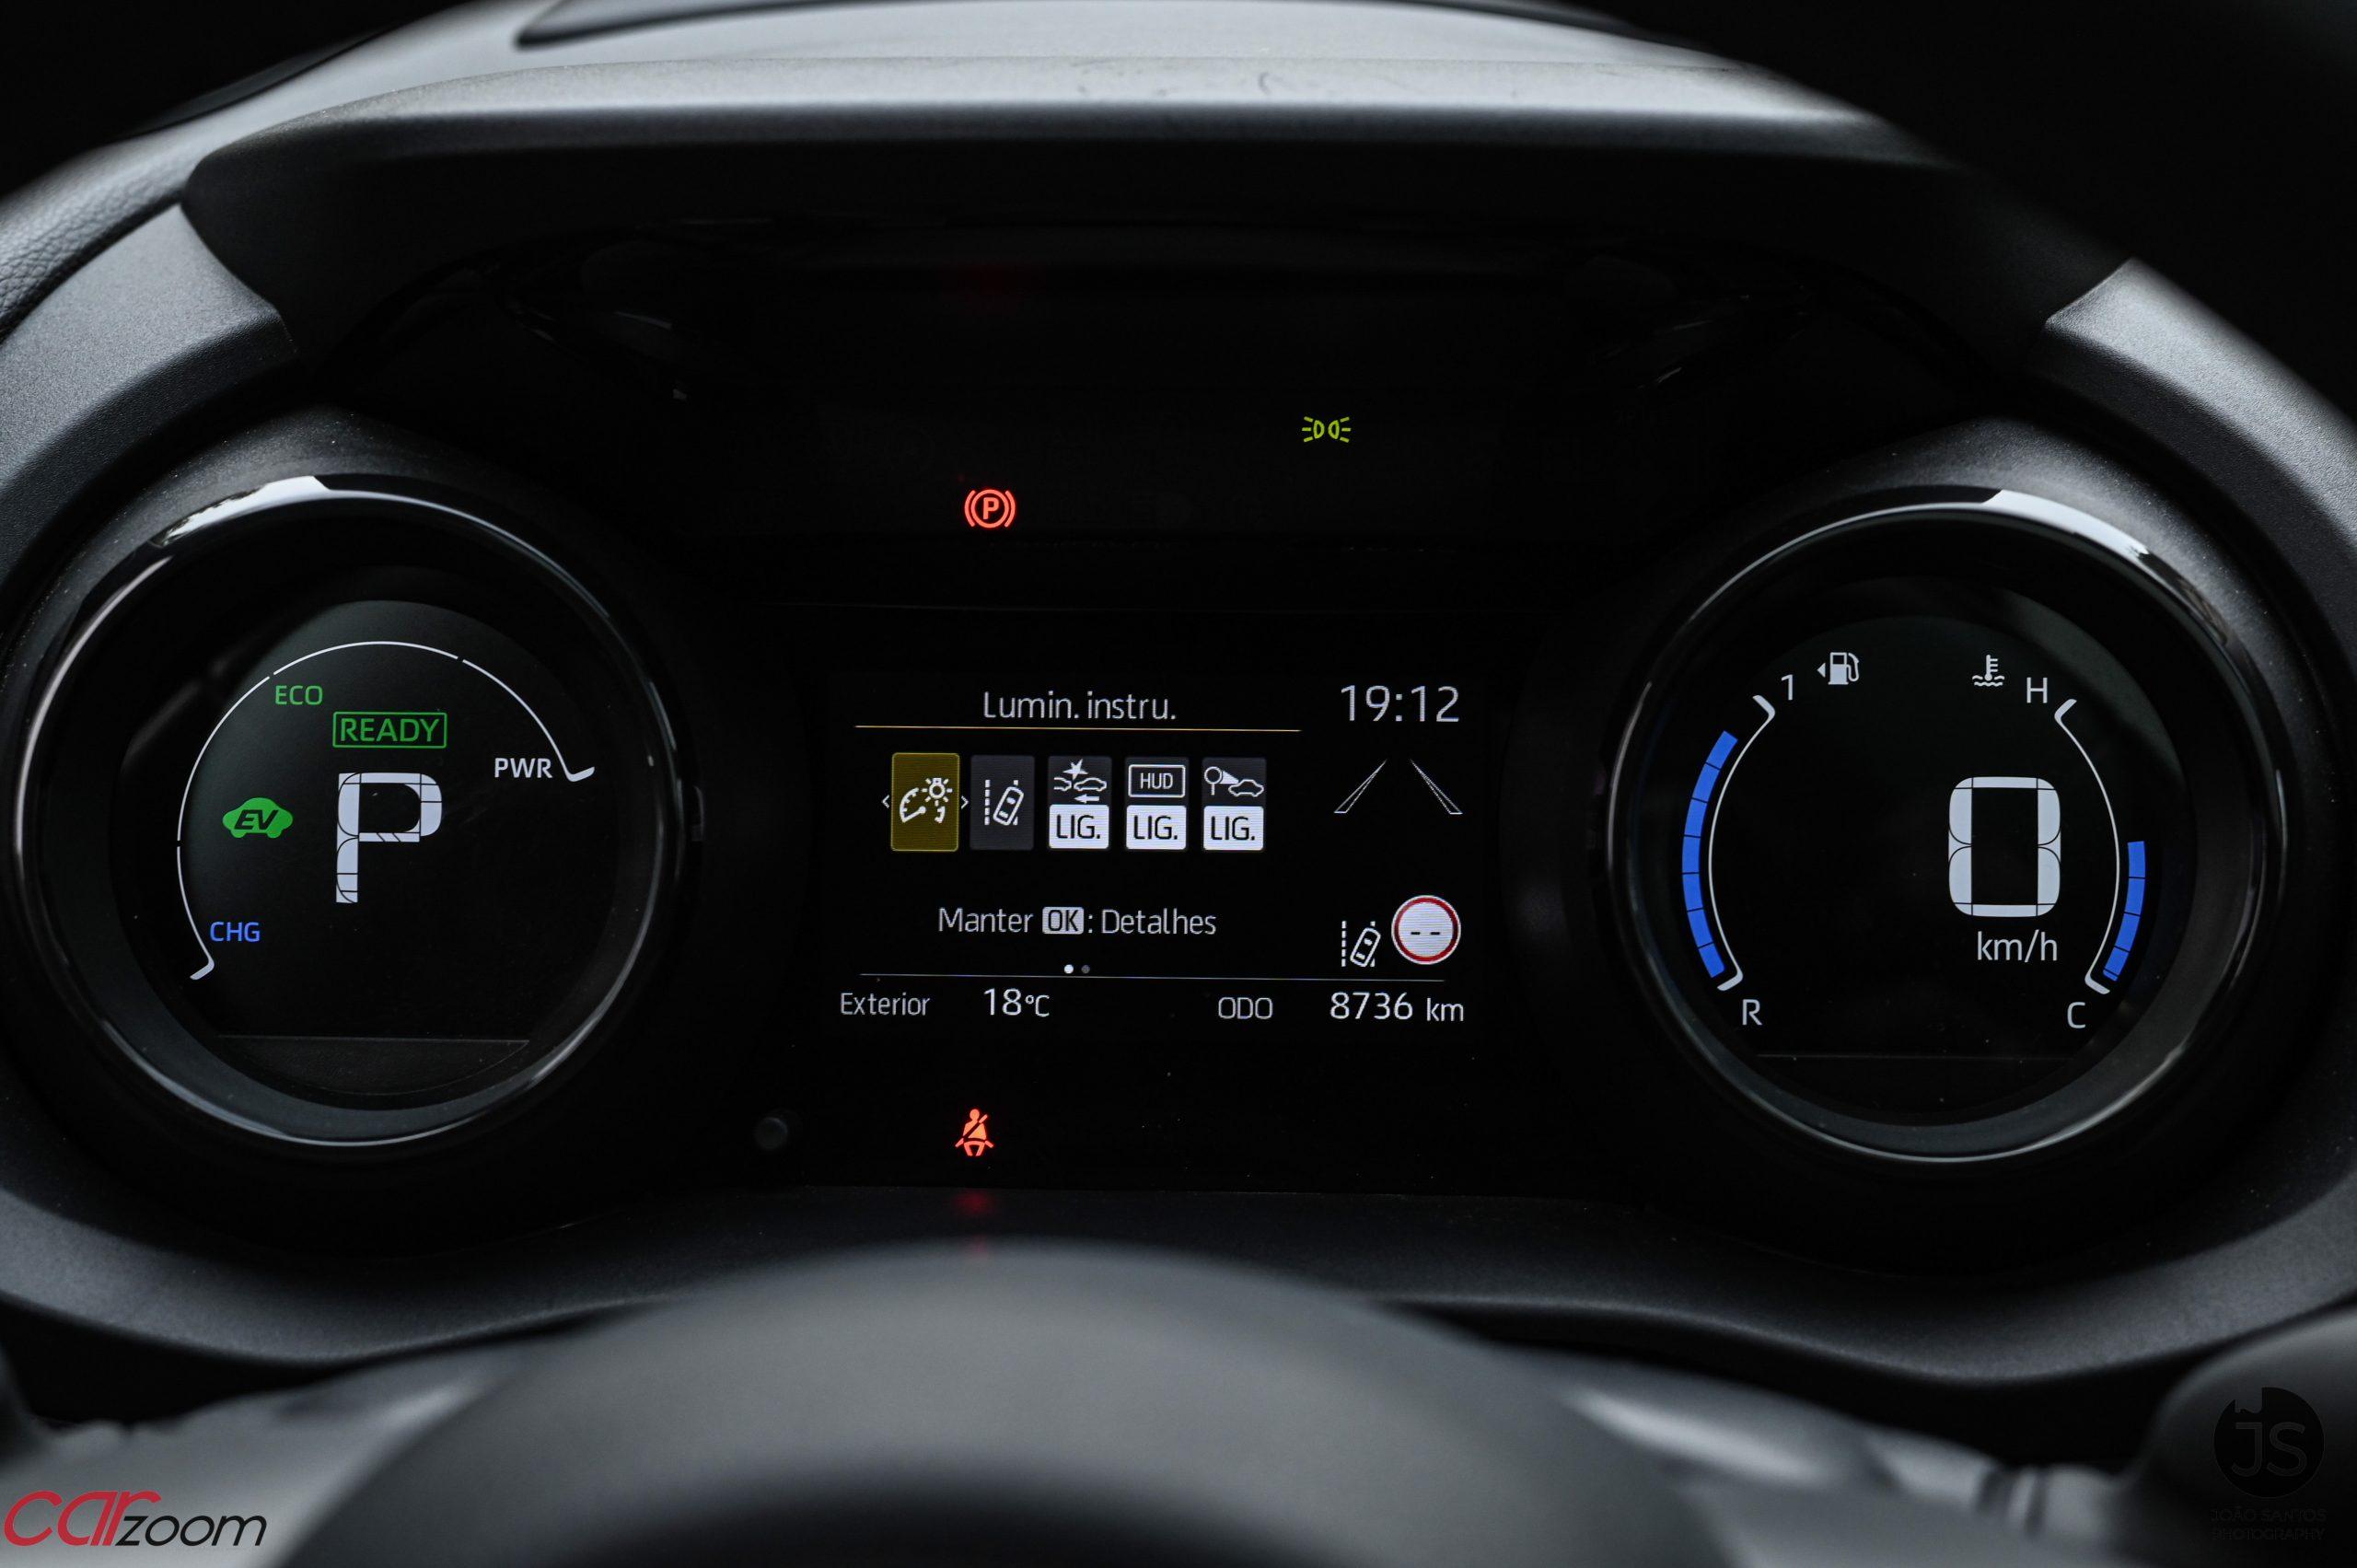 TOYOTA YARIS PREMIER EDITION 1.5 Hybrid: Um híbrido com alma! 30